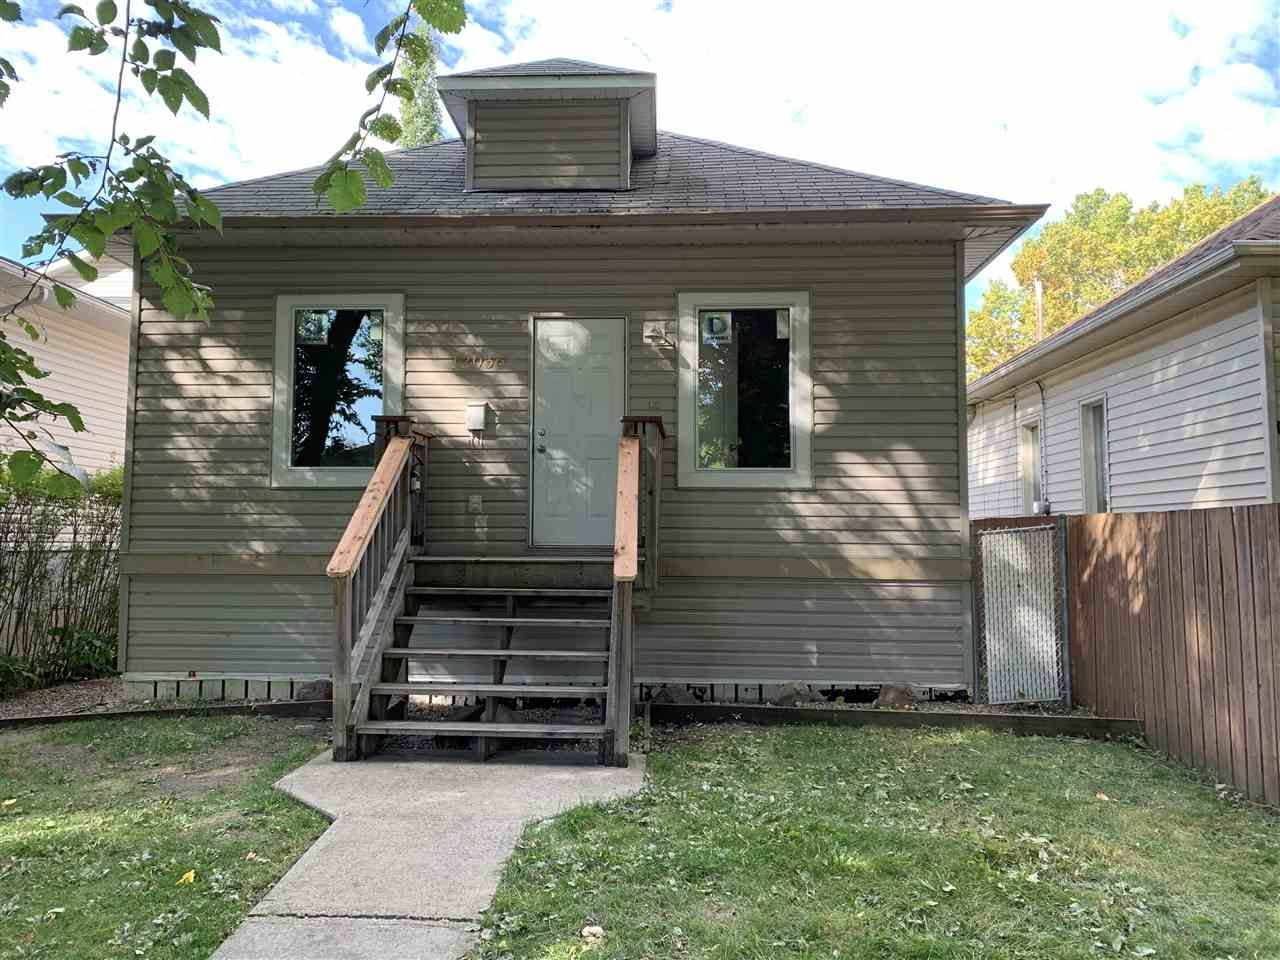 Main Photo: 12036 91 Street in Edmonton: Zone 05 House for sale : MLS®# E4224597